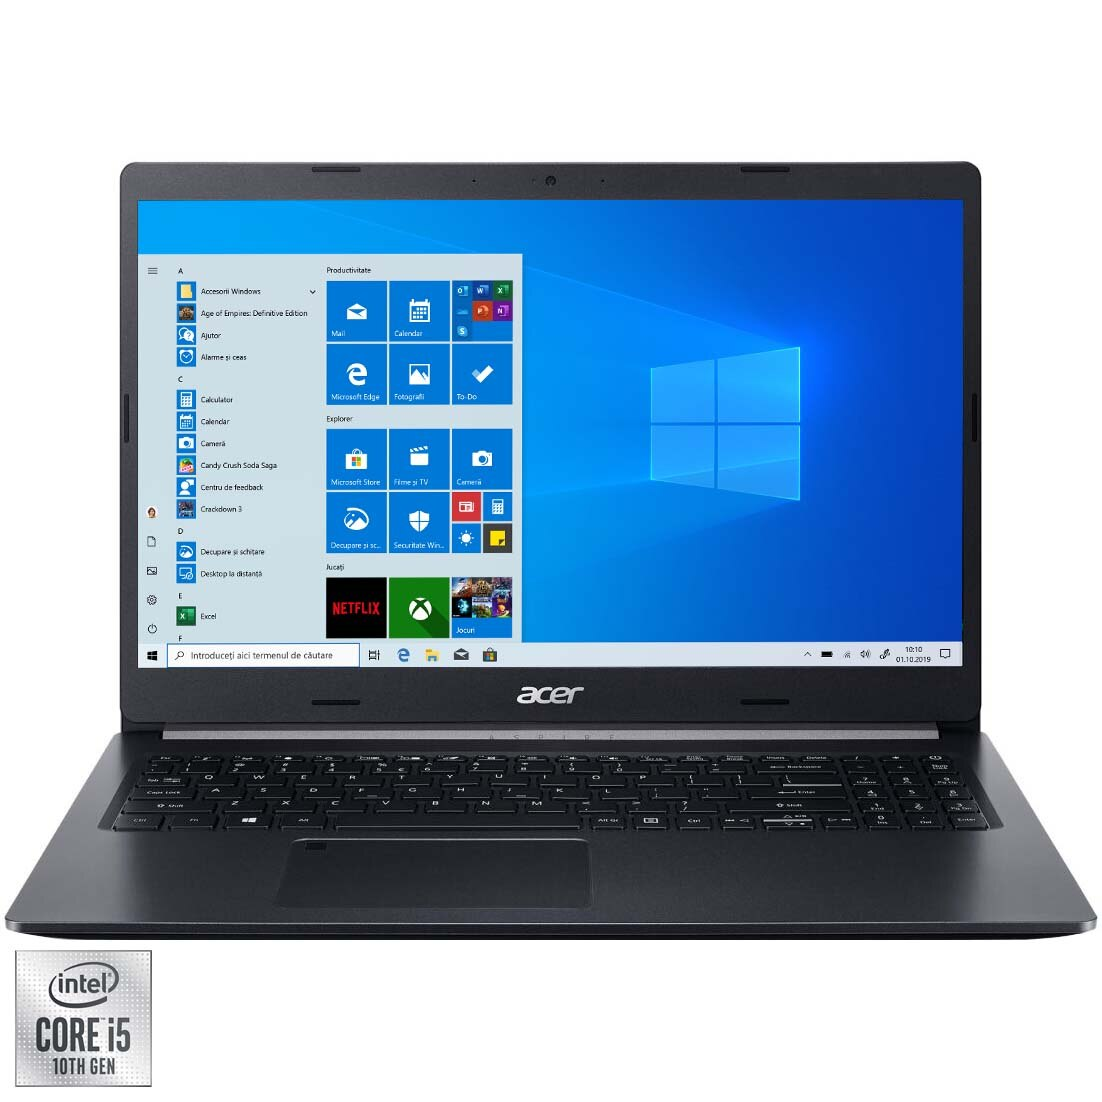 "Fotografie Laptop Acer Aspire 5 A515 cu procesor Intel® Core ™ i5-1035G1 pana la 3.60 GHz, 15.6"", Full HD, 8GB, 512GB SSD, Intel® UHD Graphics, Windows 10 Home, Black"